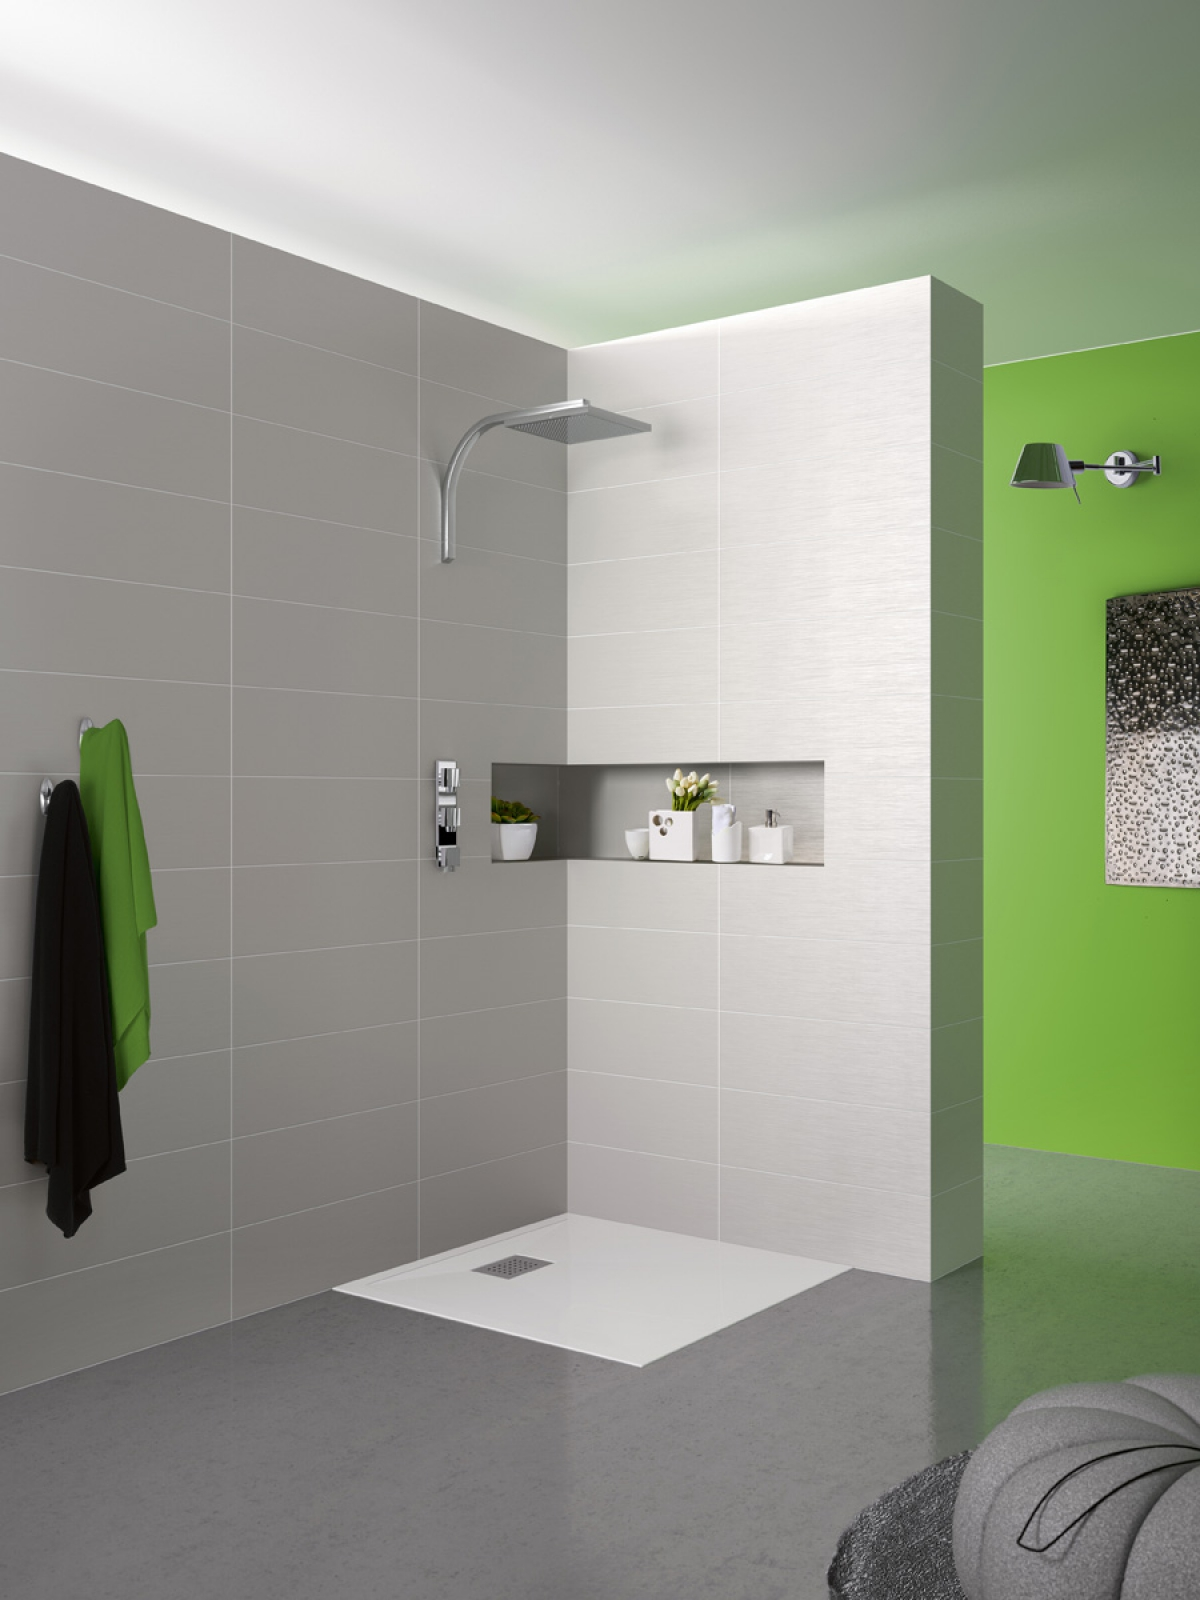 Receveur de douche kinesurf kinedo induscabel salle de bains chauffage et cuisine - Receveur de douche kinedo kinesurf ...